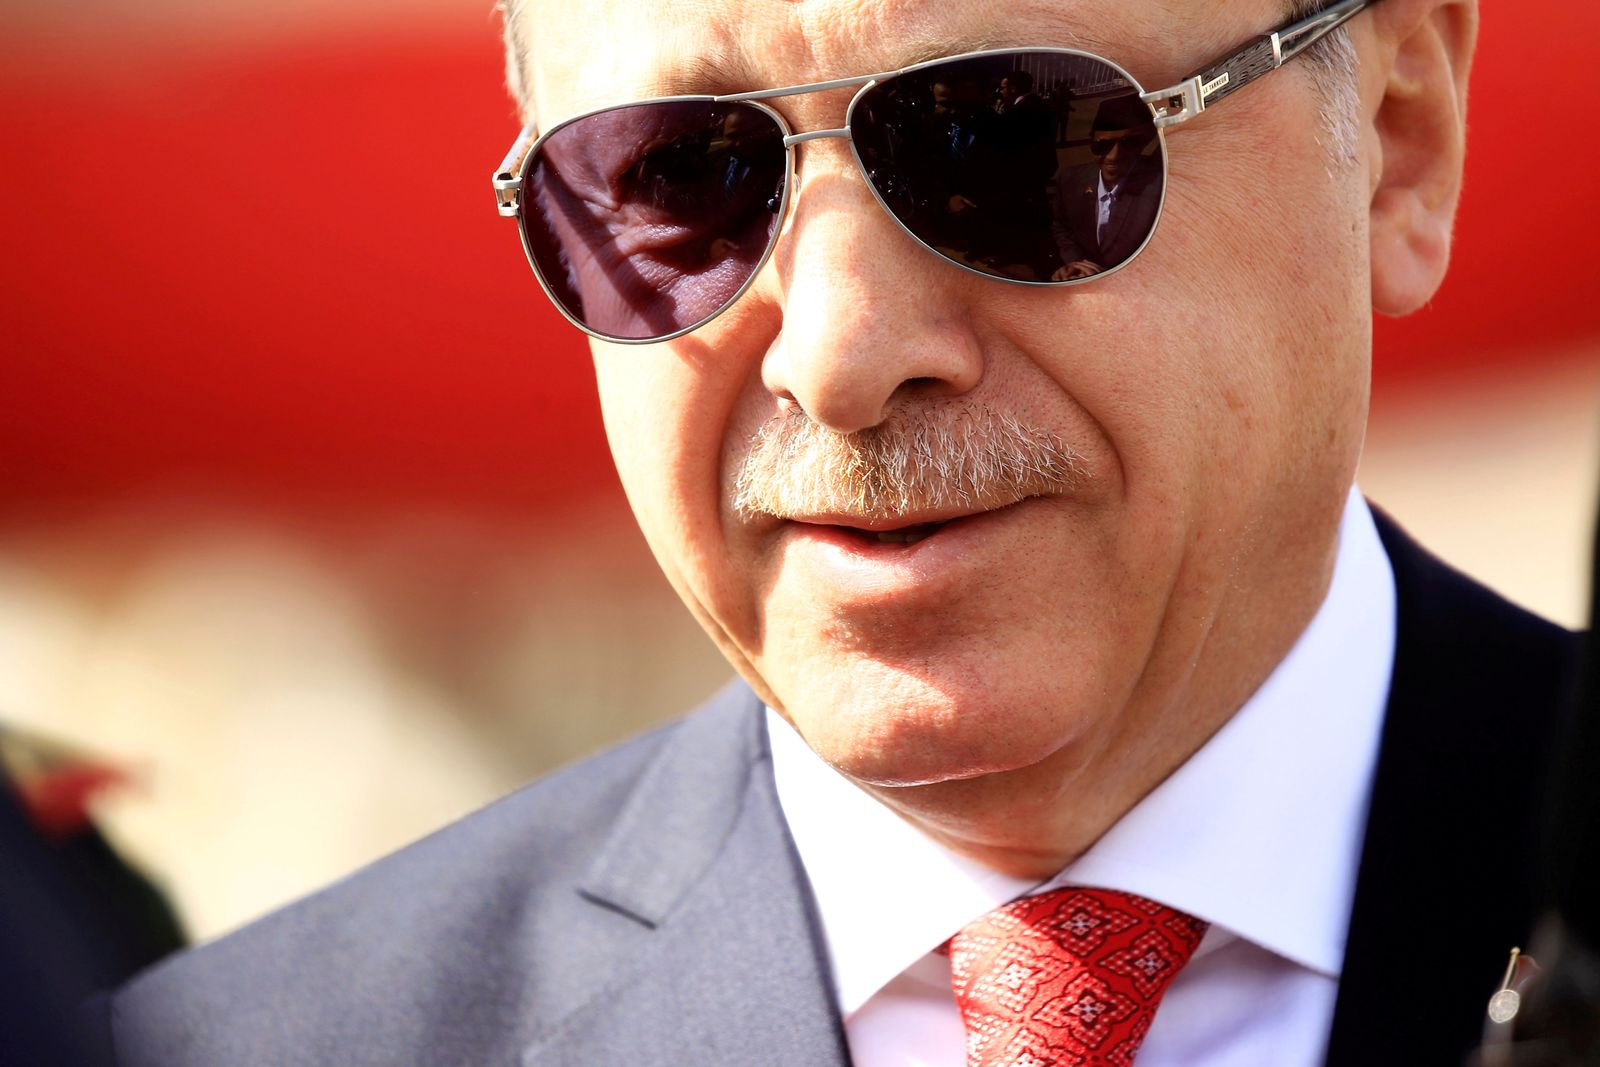 TURKEY-SUDAN/